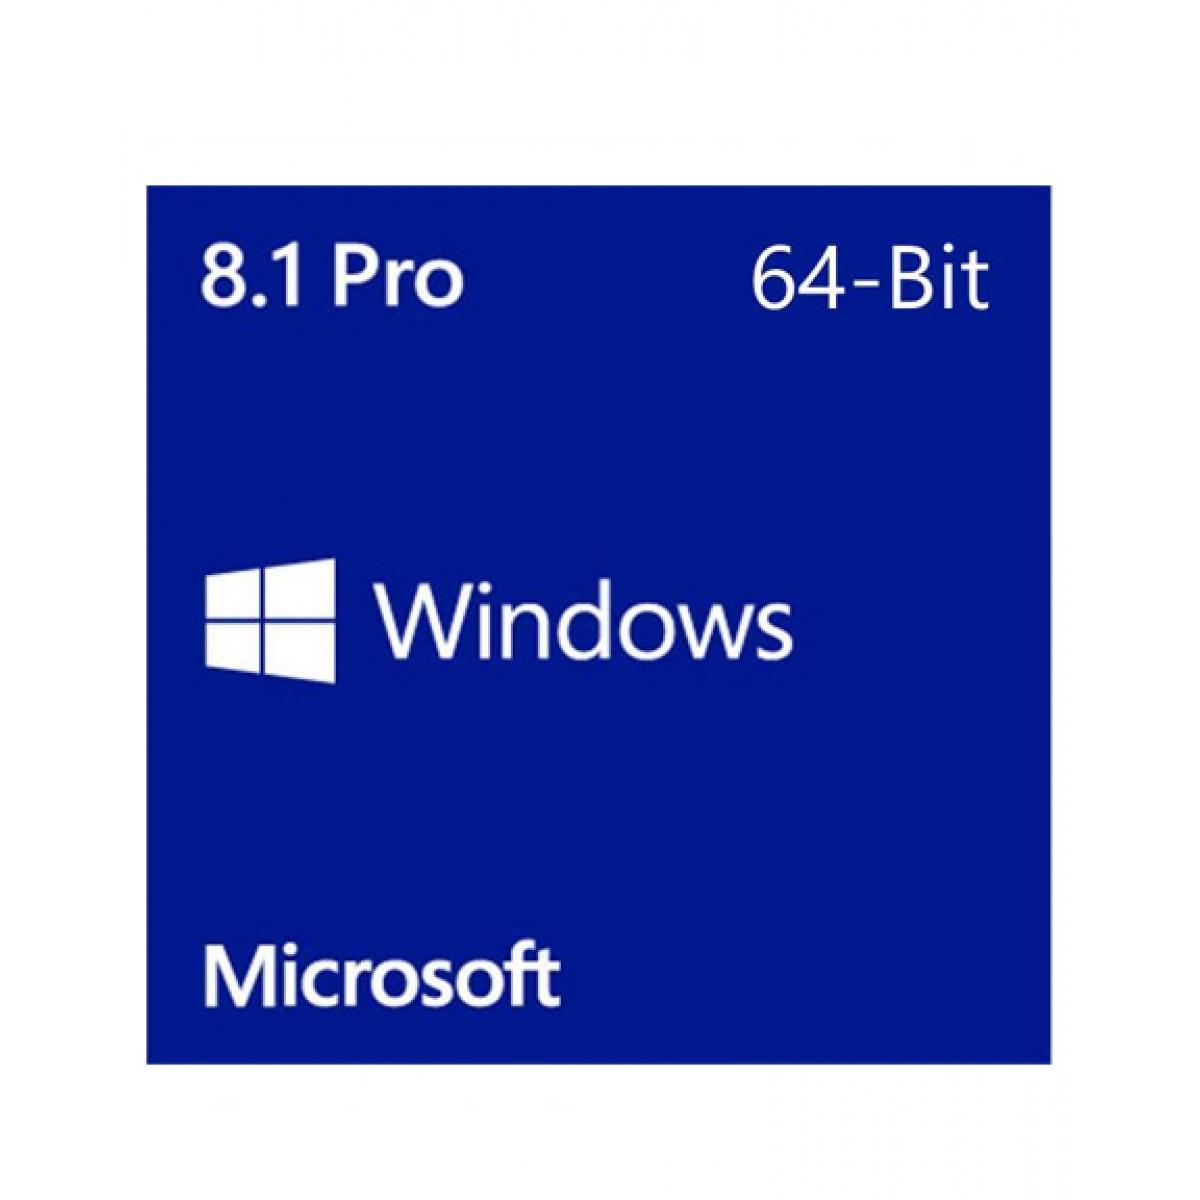 Windows 8.1 discount price